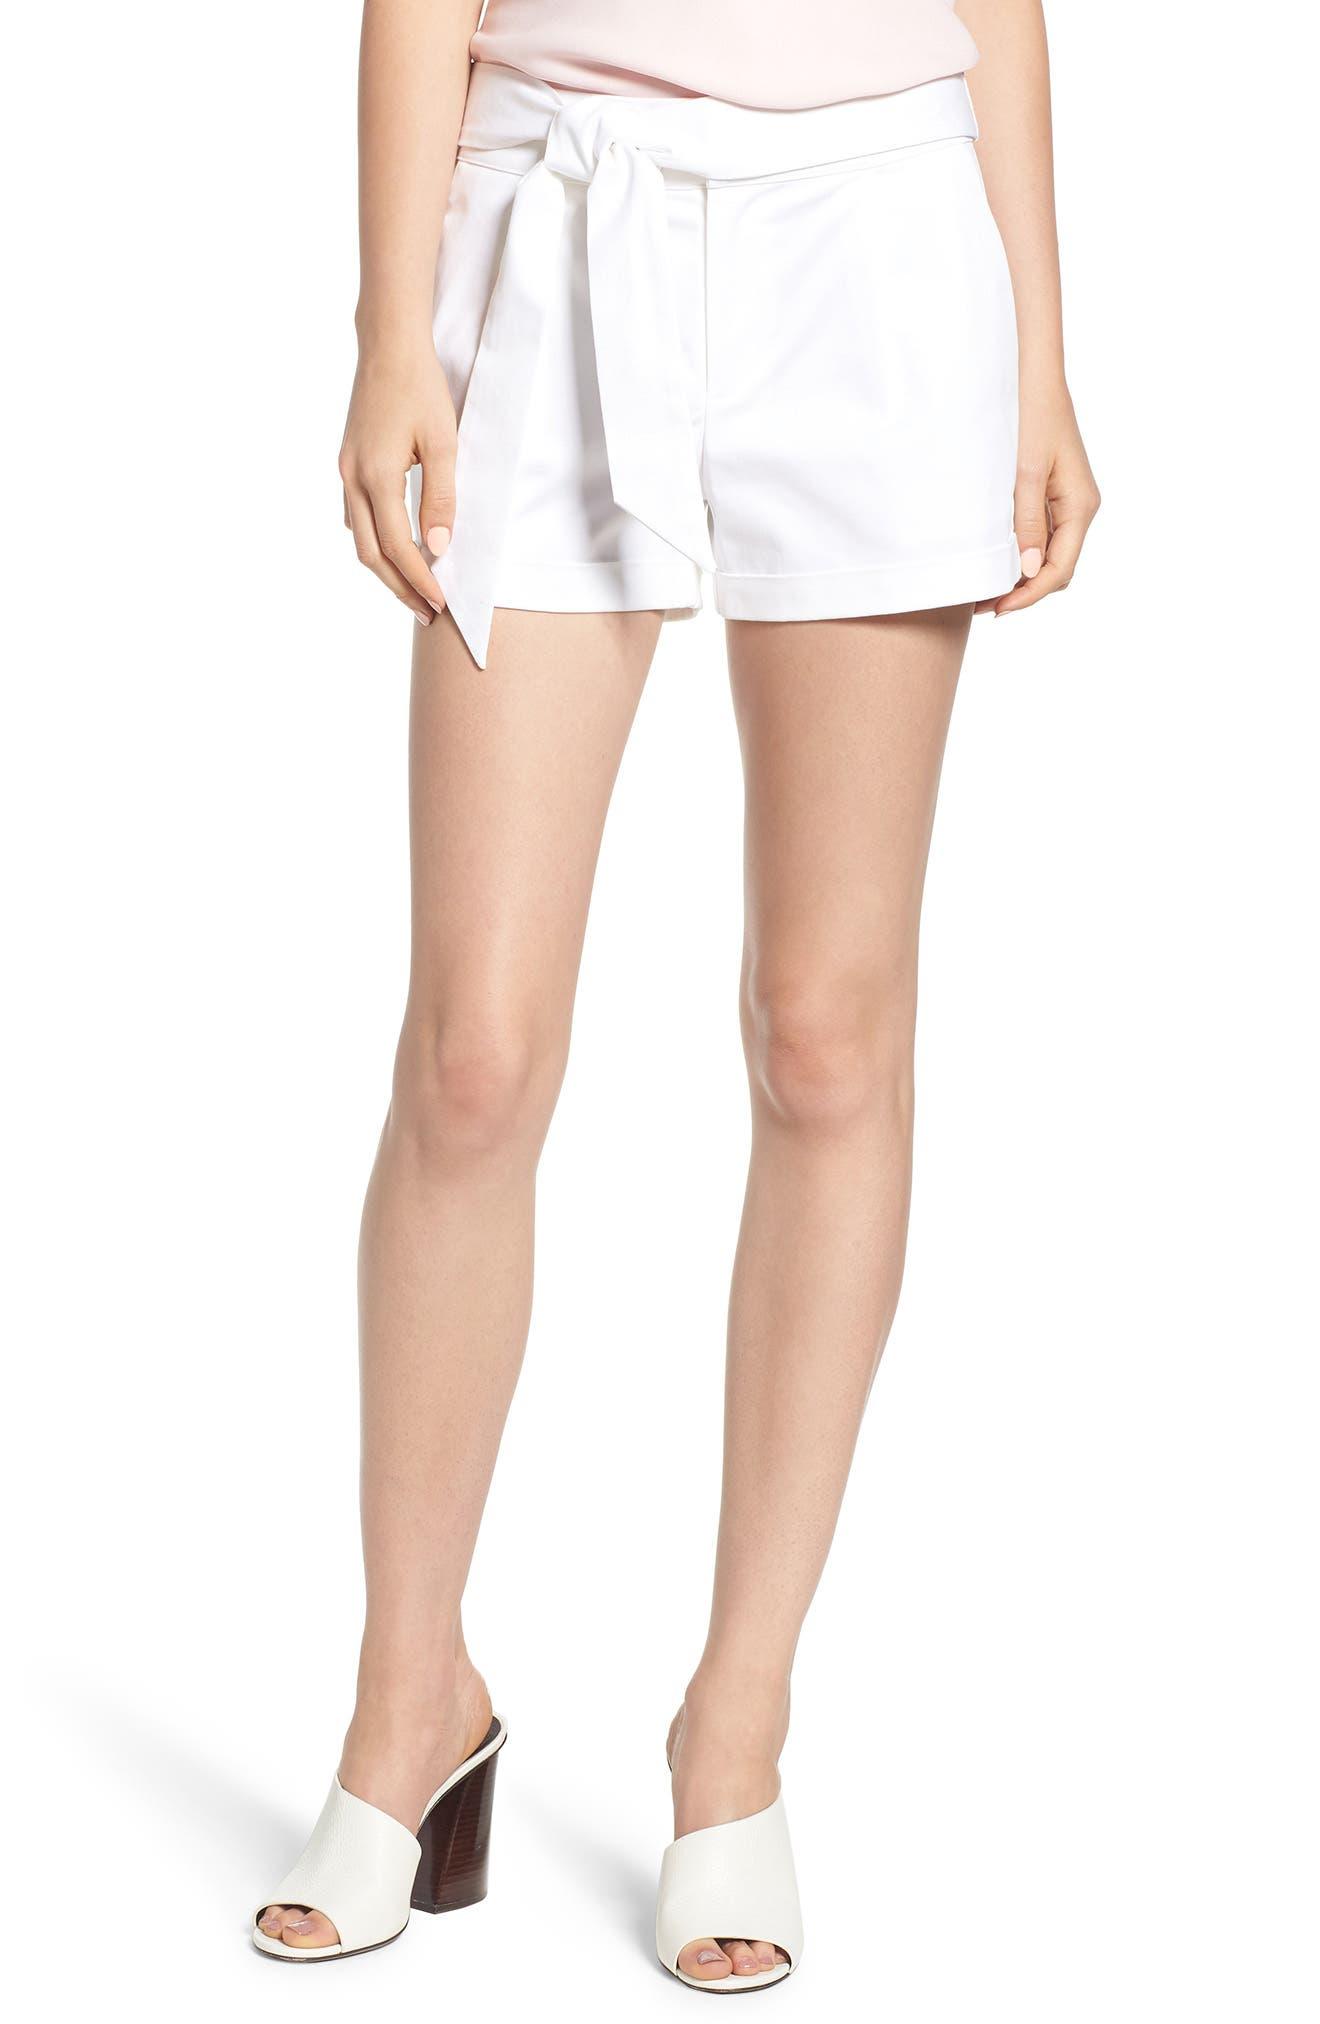 Yelinda Shorts,                         Main,                         color, 100